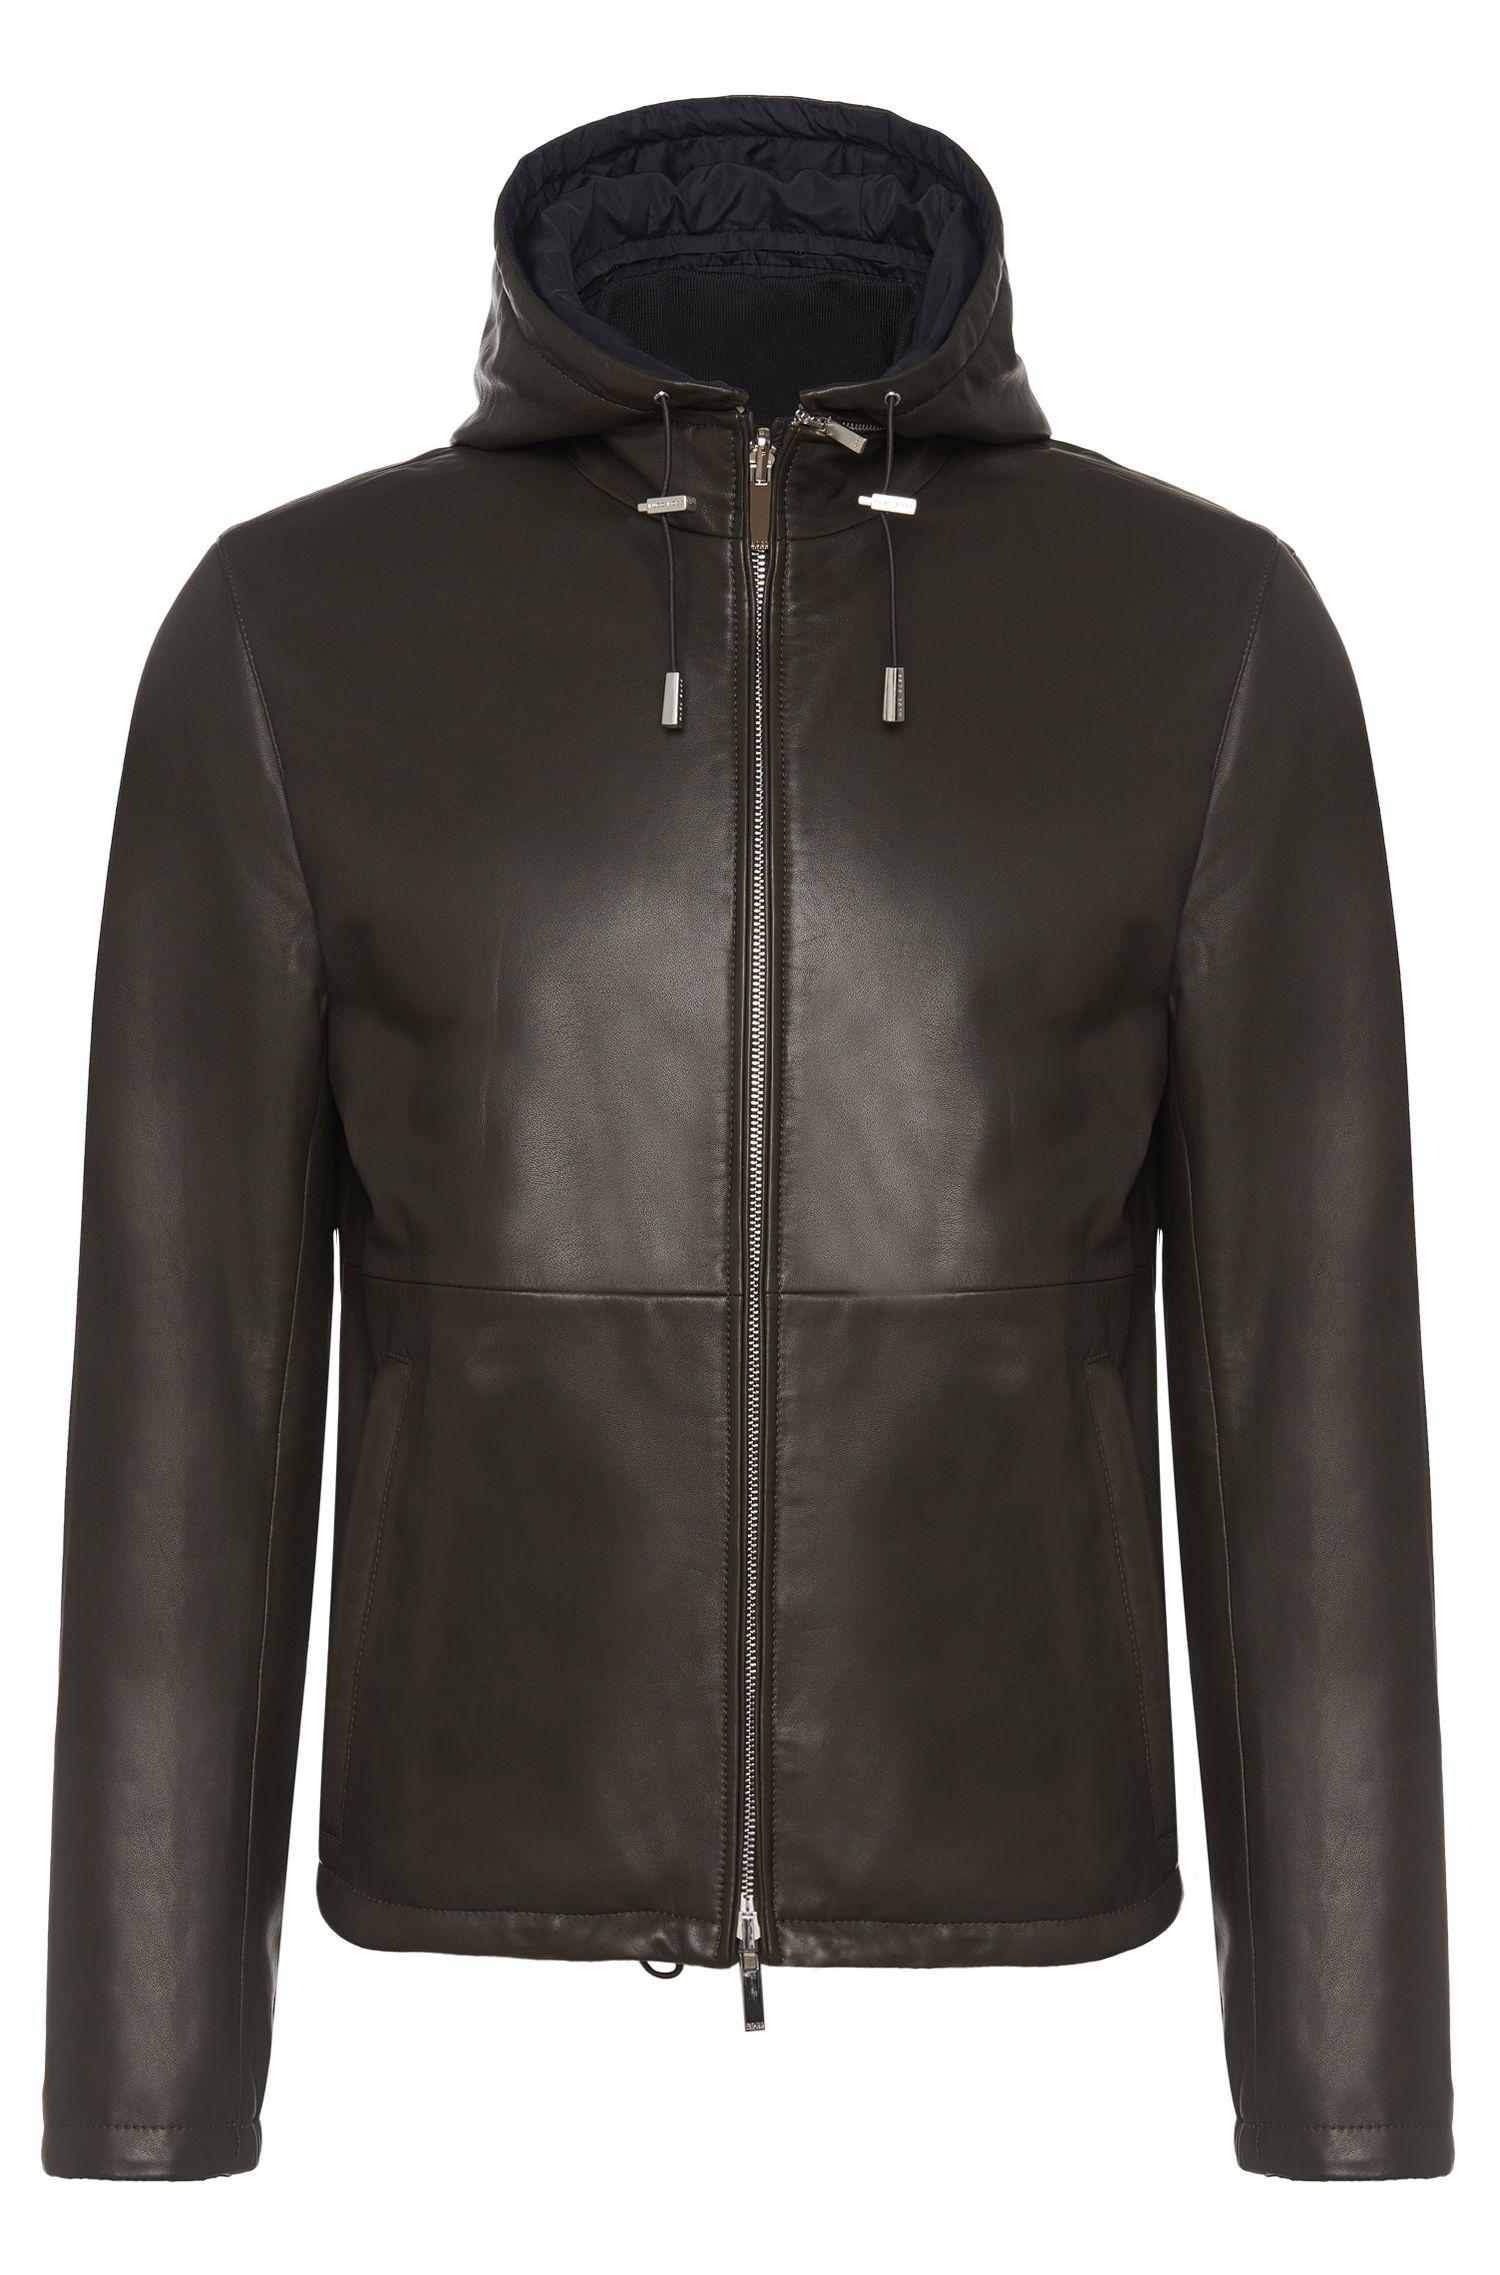 'Driffis' | Lambskin Reversible Jacket, Detachable Hood